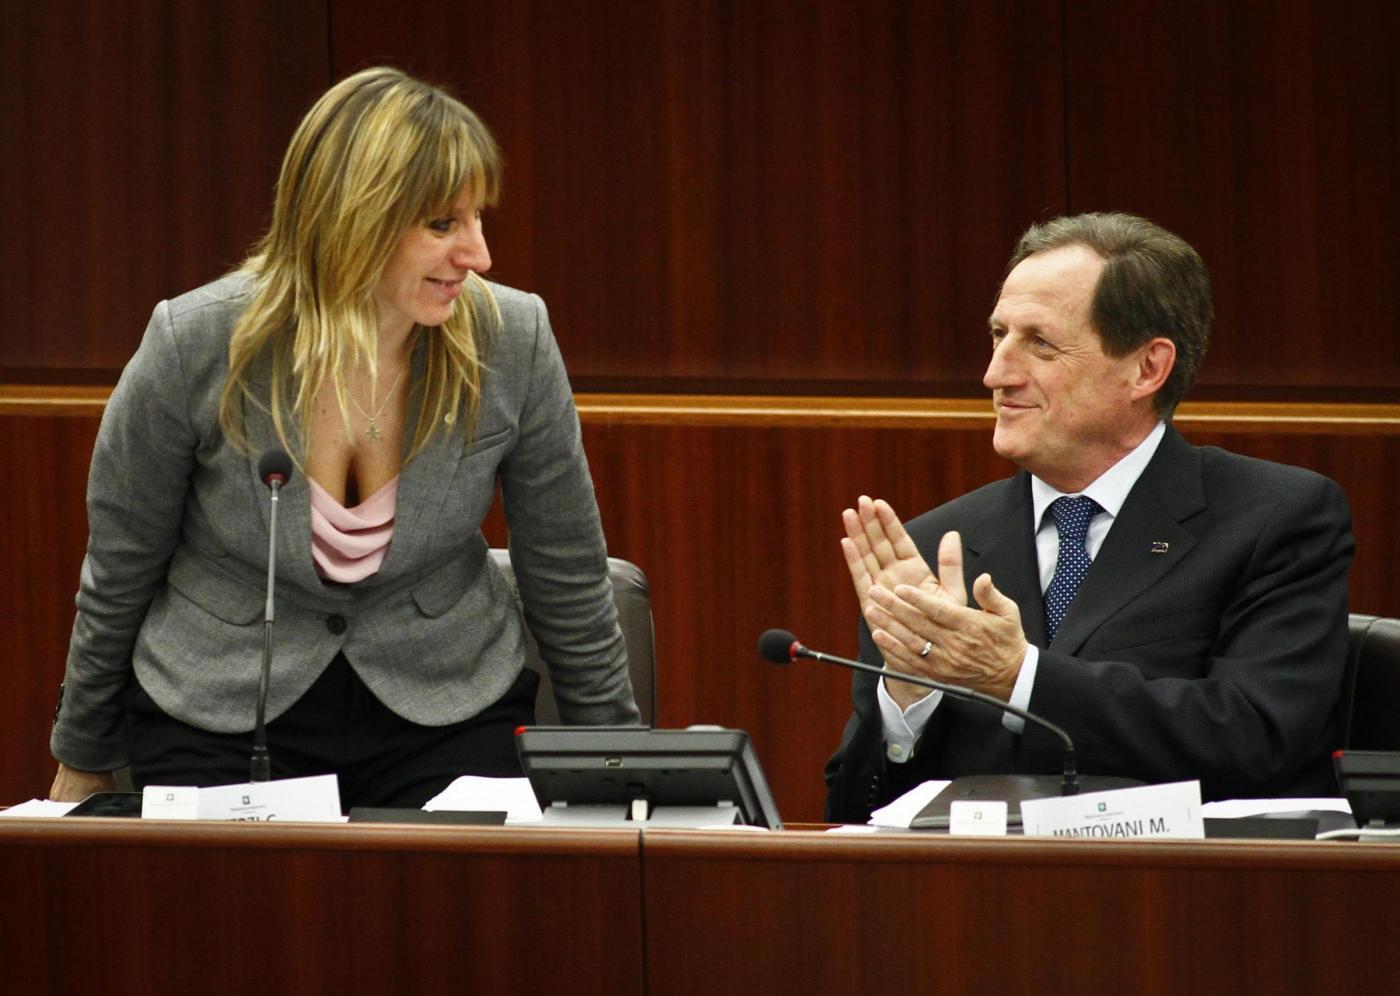 Regione Lombardia : prima seduta della X legislatura